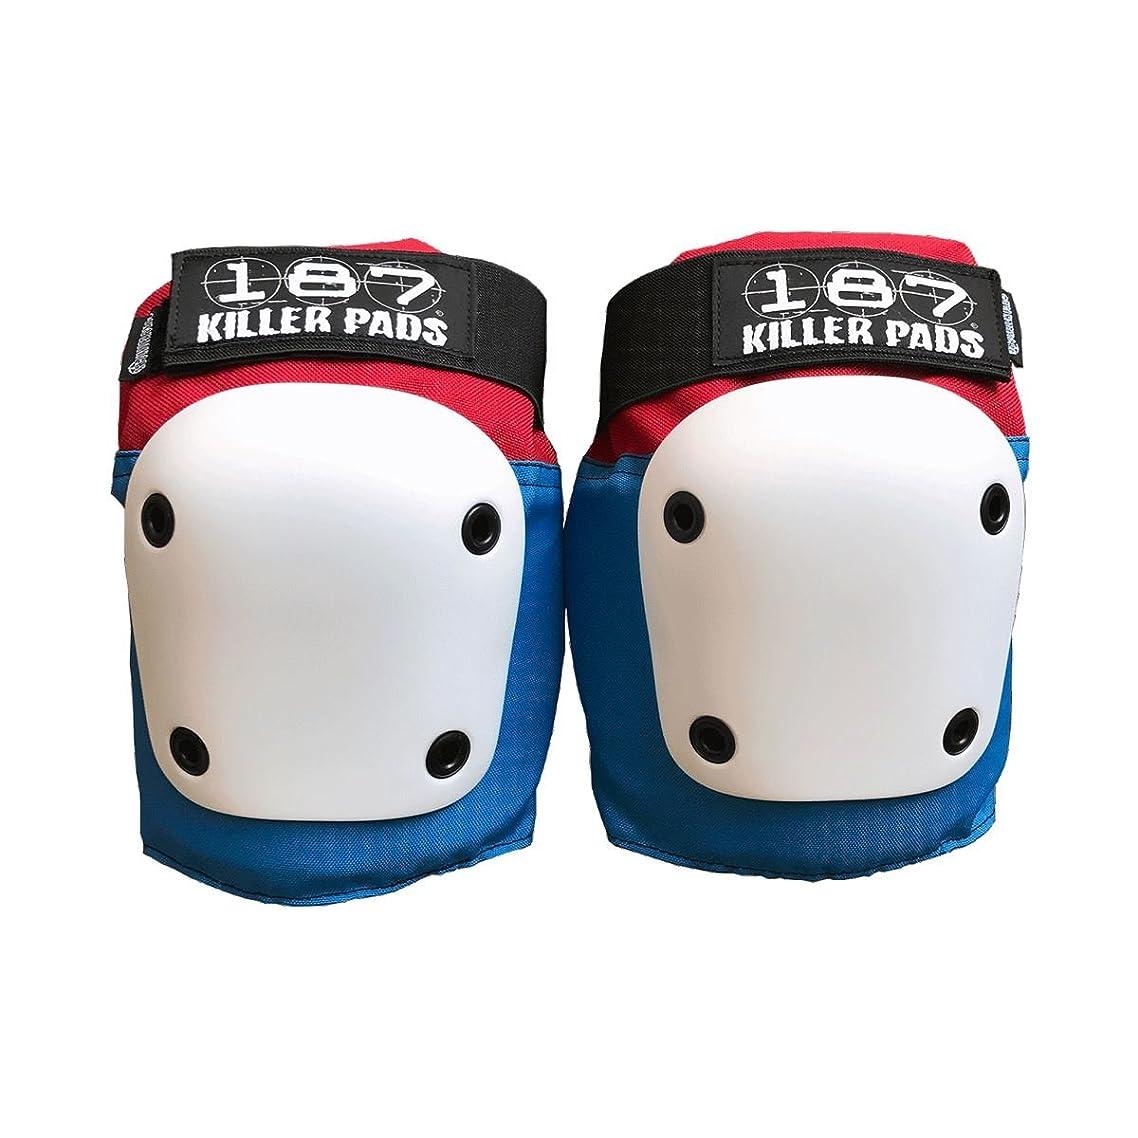 187 Killer Pads Fly Knee Red/White/Blue